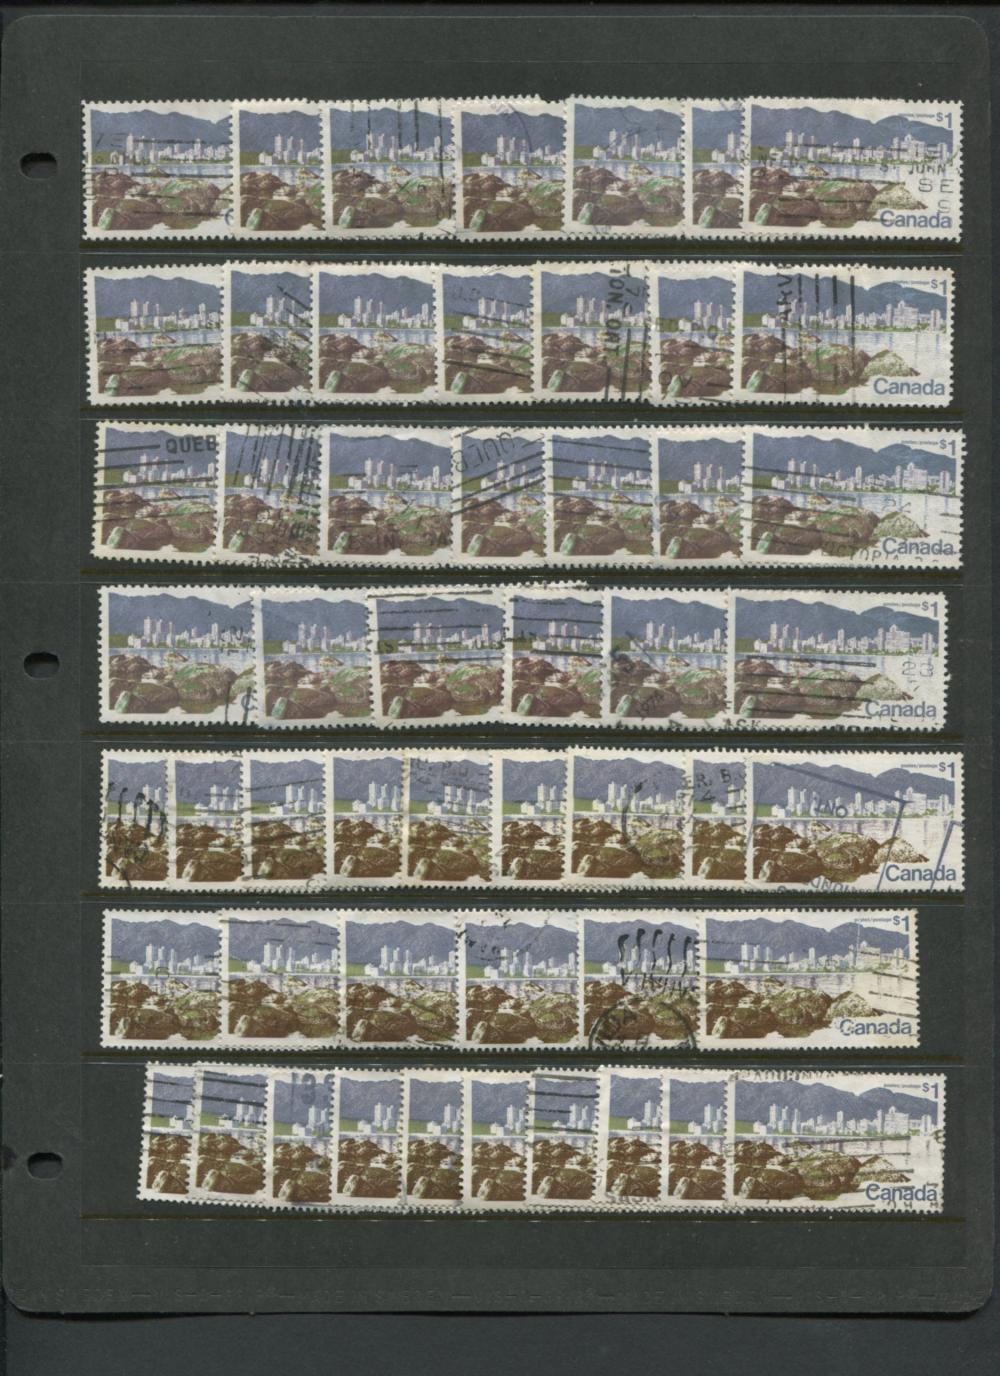 Canada 1972-77 Landscape Definitives Stamp Collection